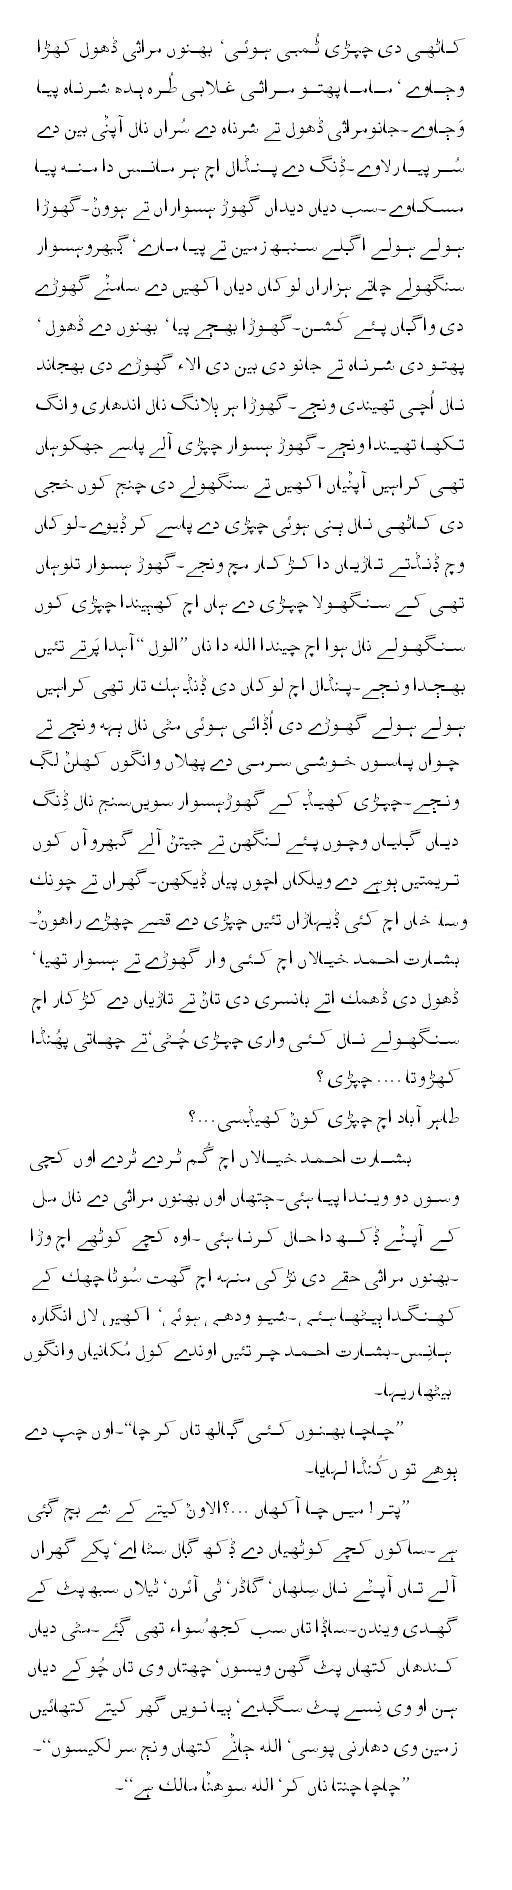 Dding (Hamid Siraj/ Translator Saeed Akhtar Zia) - Part 4